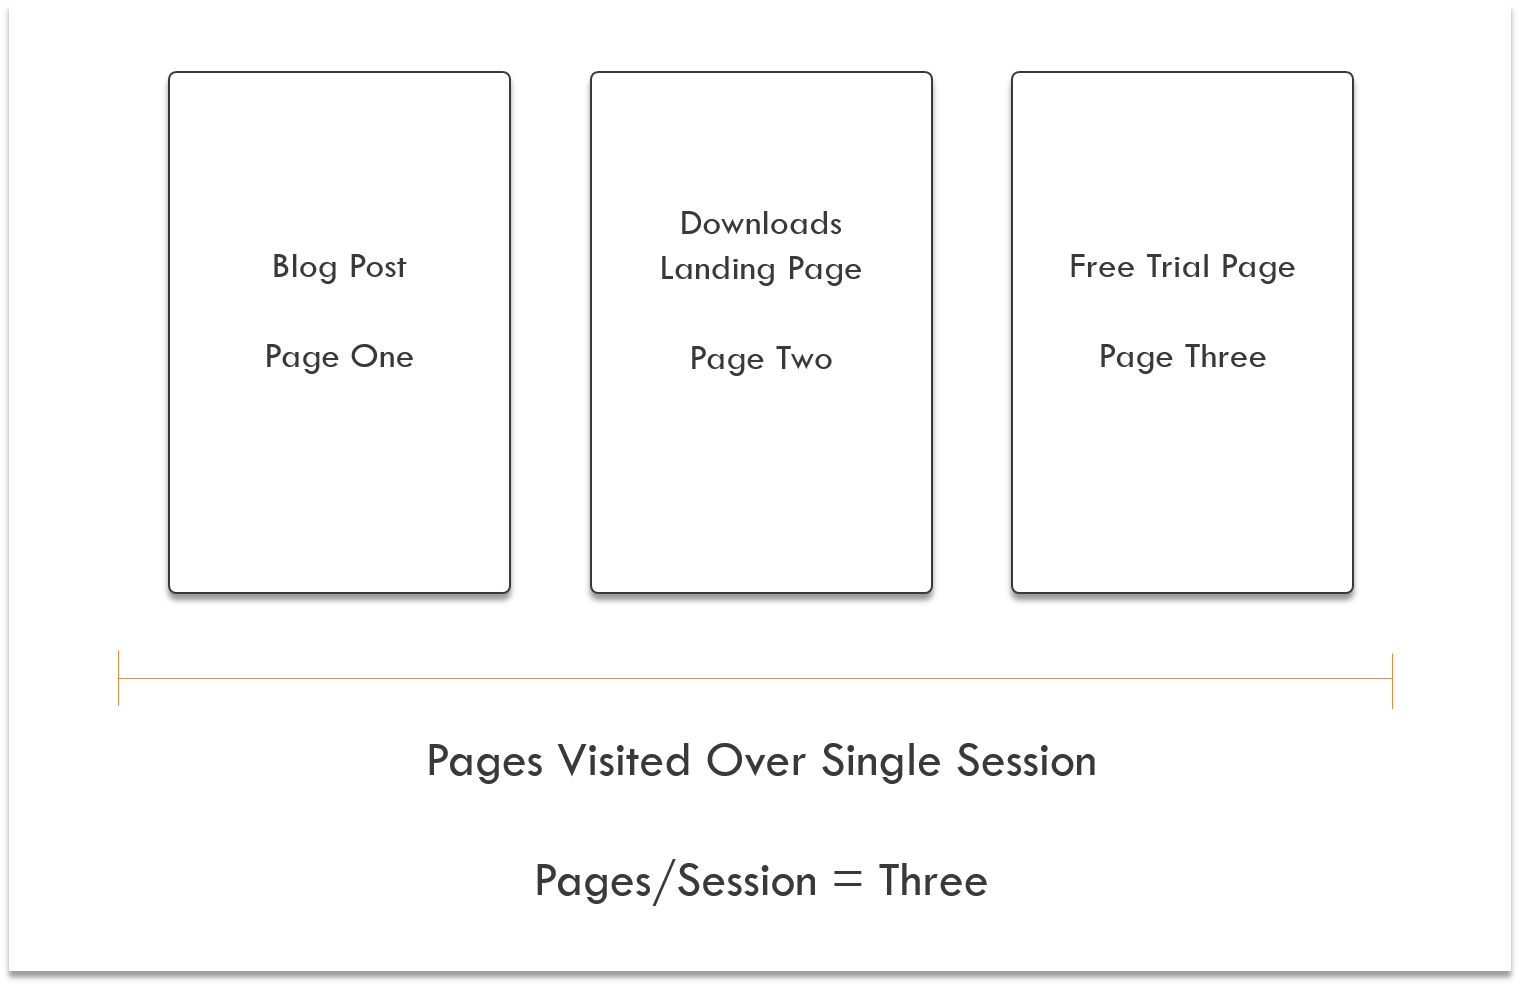 Content Engagement Metrics Pages per Session Explanation